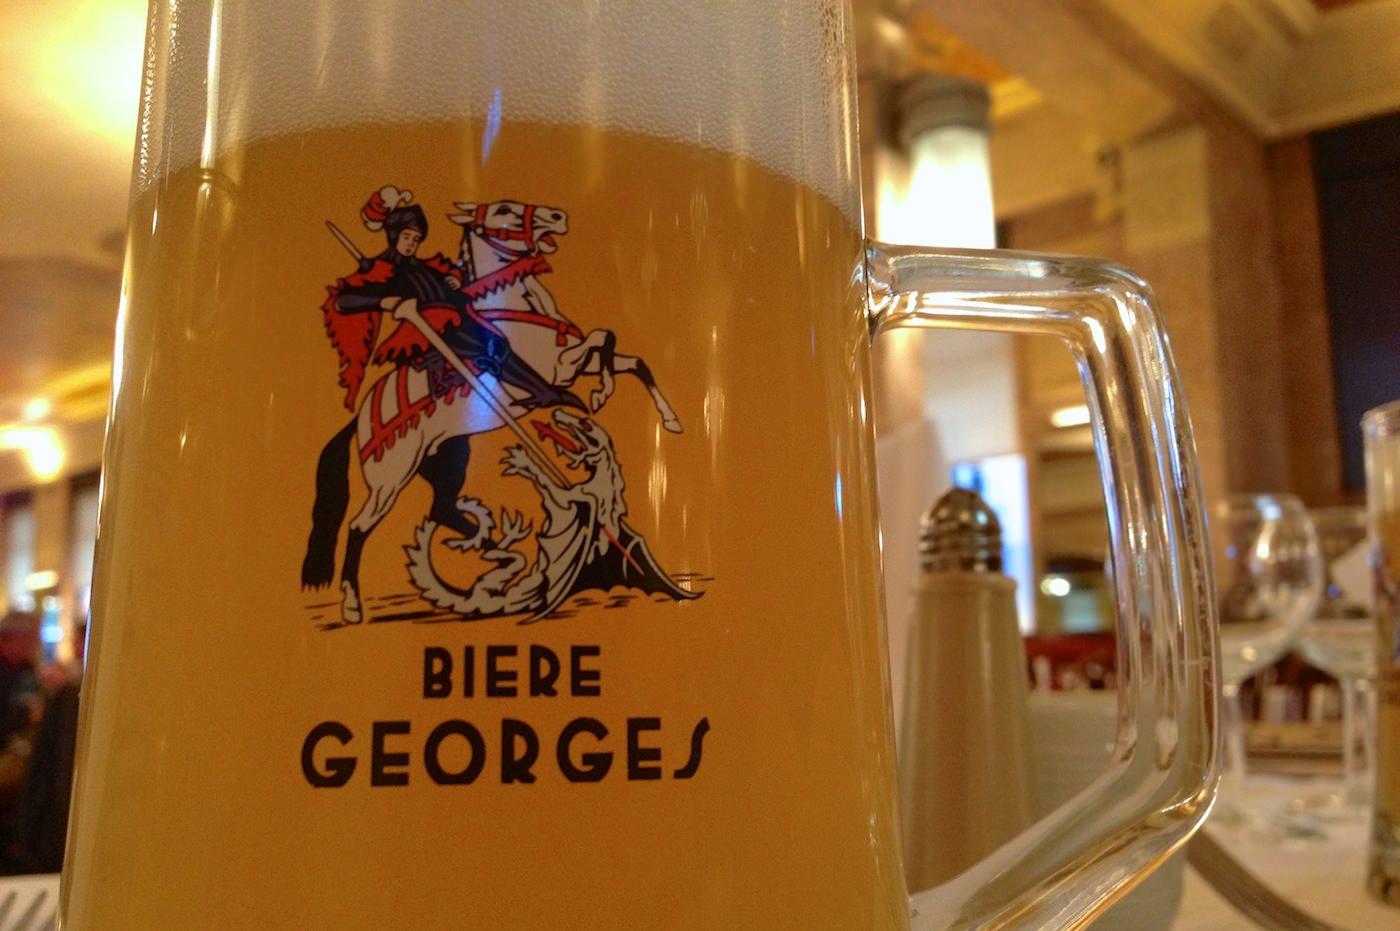 Bierre georges lyon